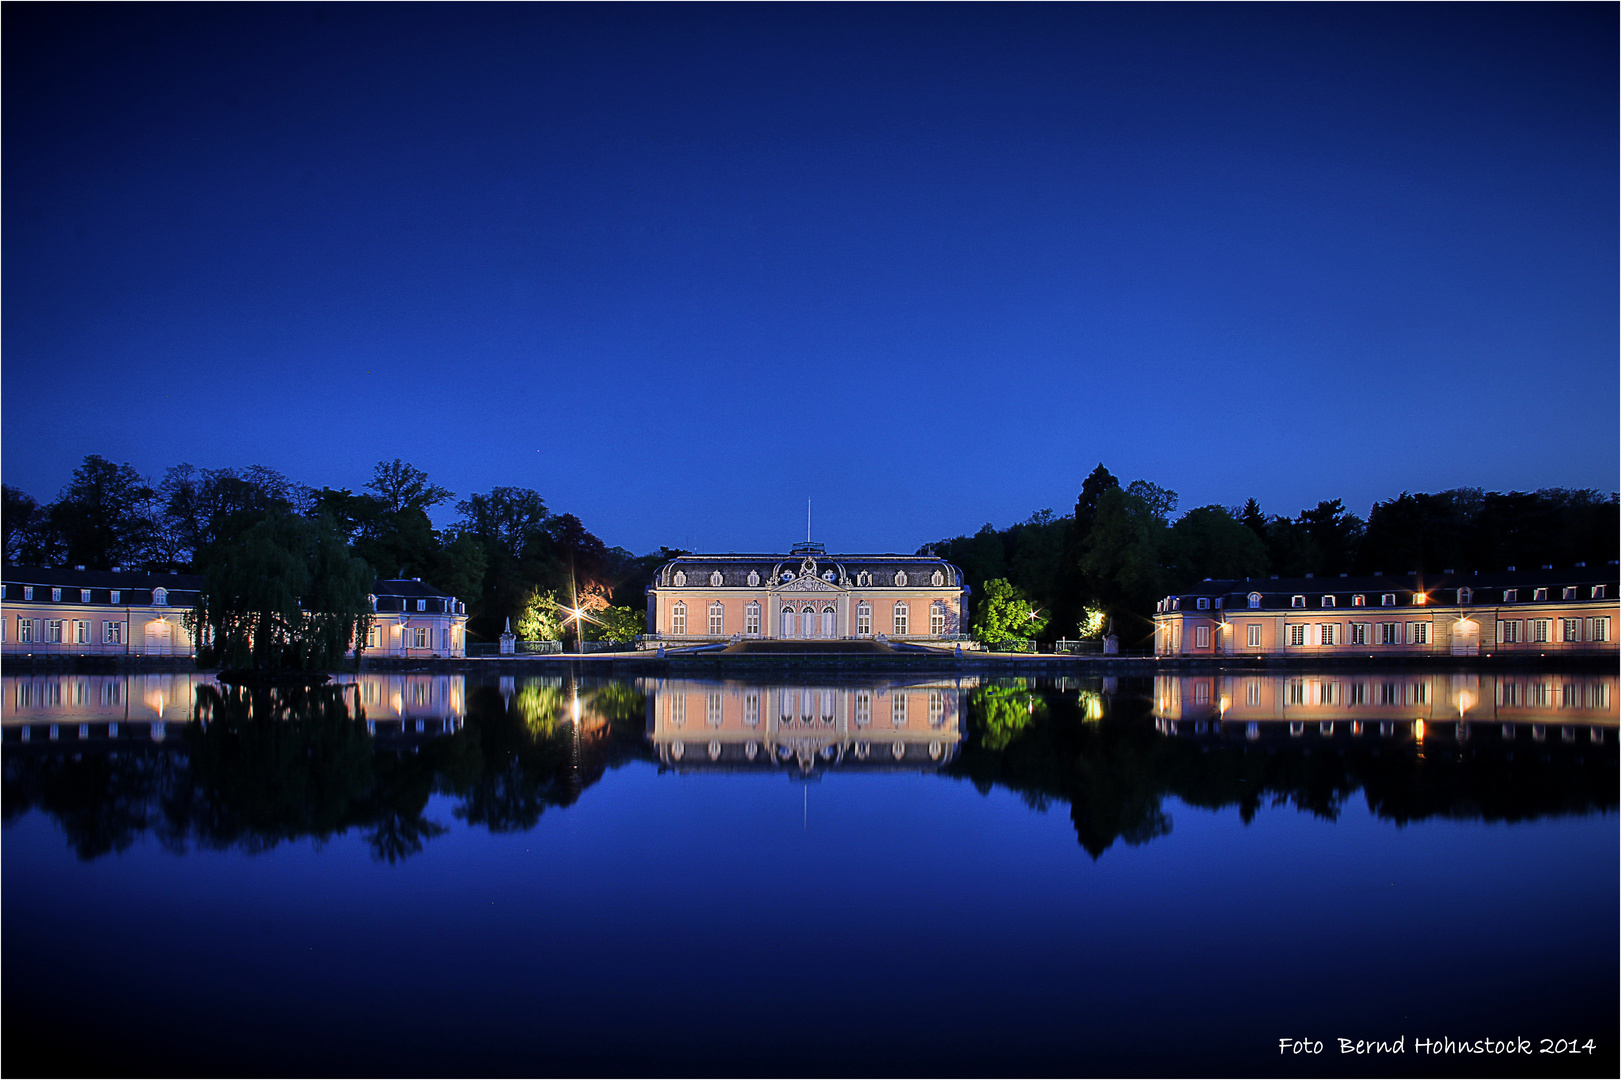 Schloss Benrath zu Dssd. am Rhein ...